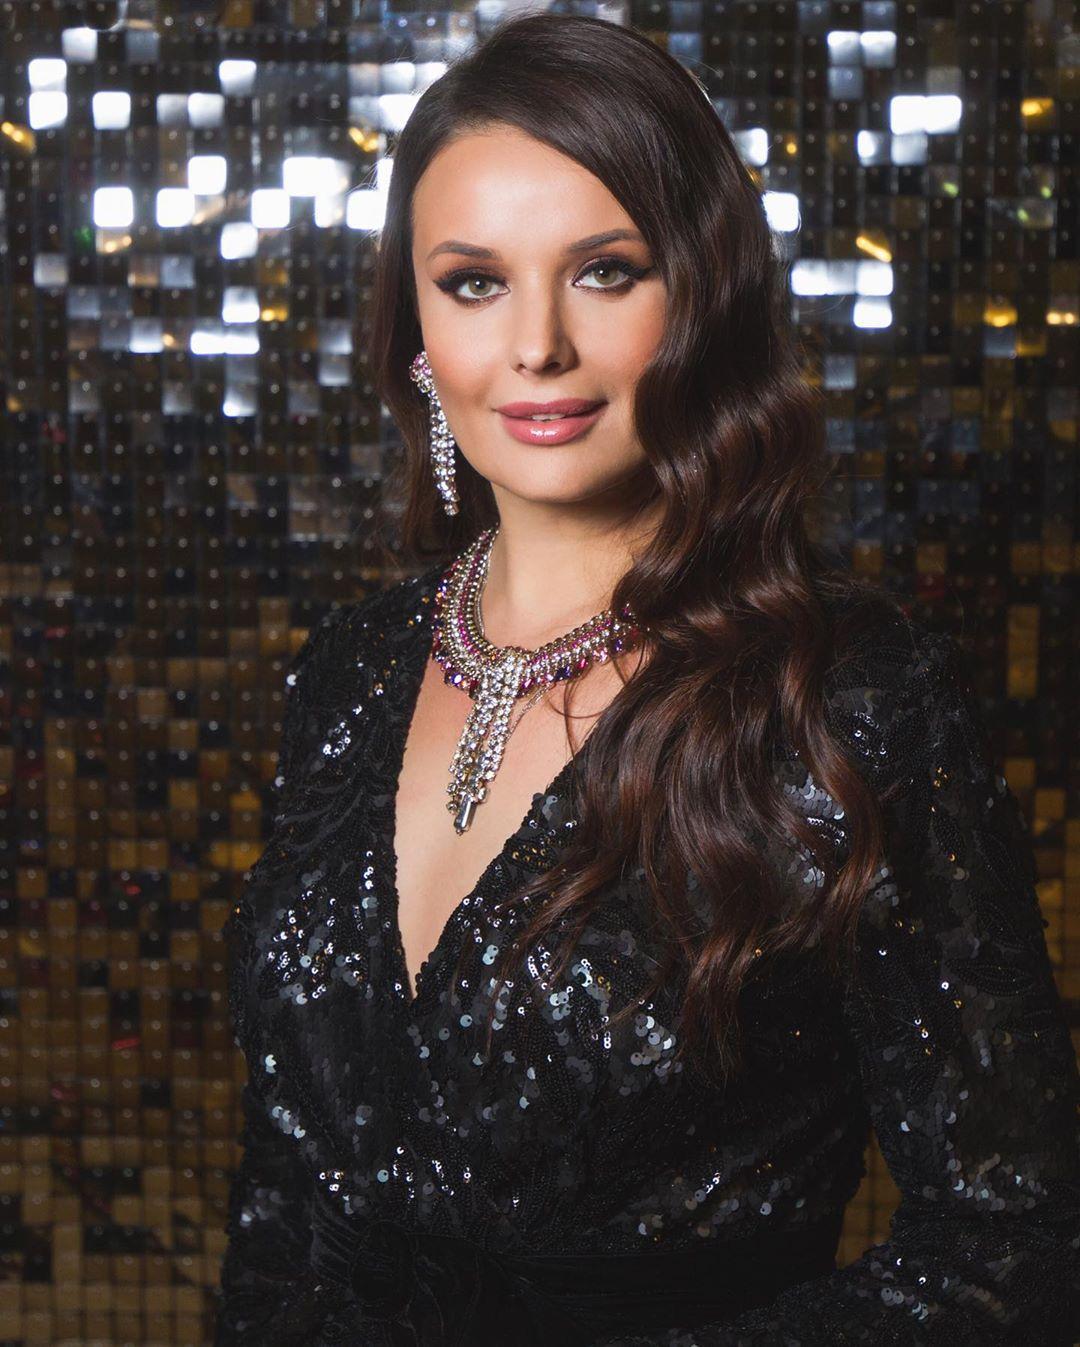 oxana fedorova, miss universe 2002 (renuncio). - Página 9 80698910